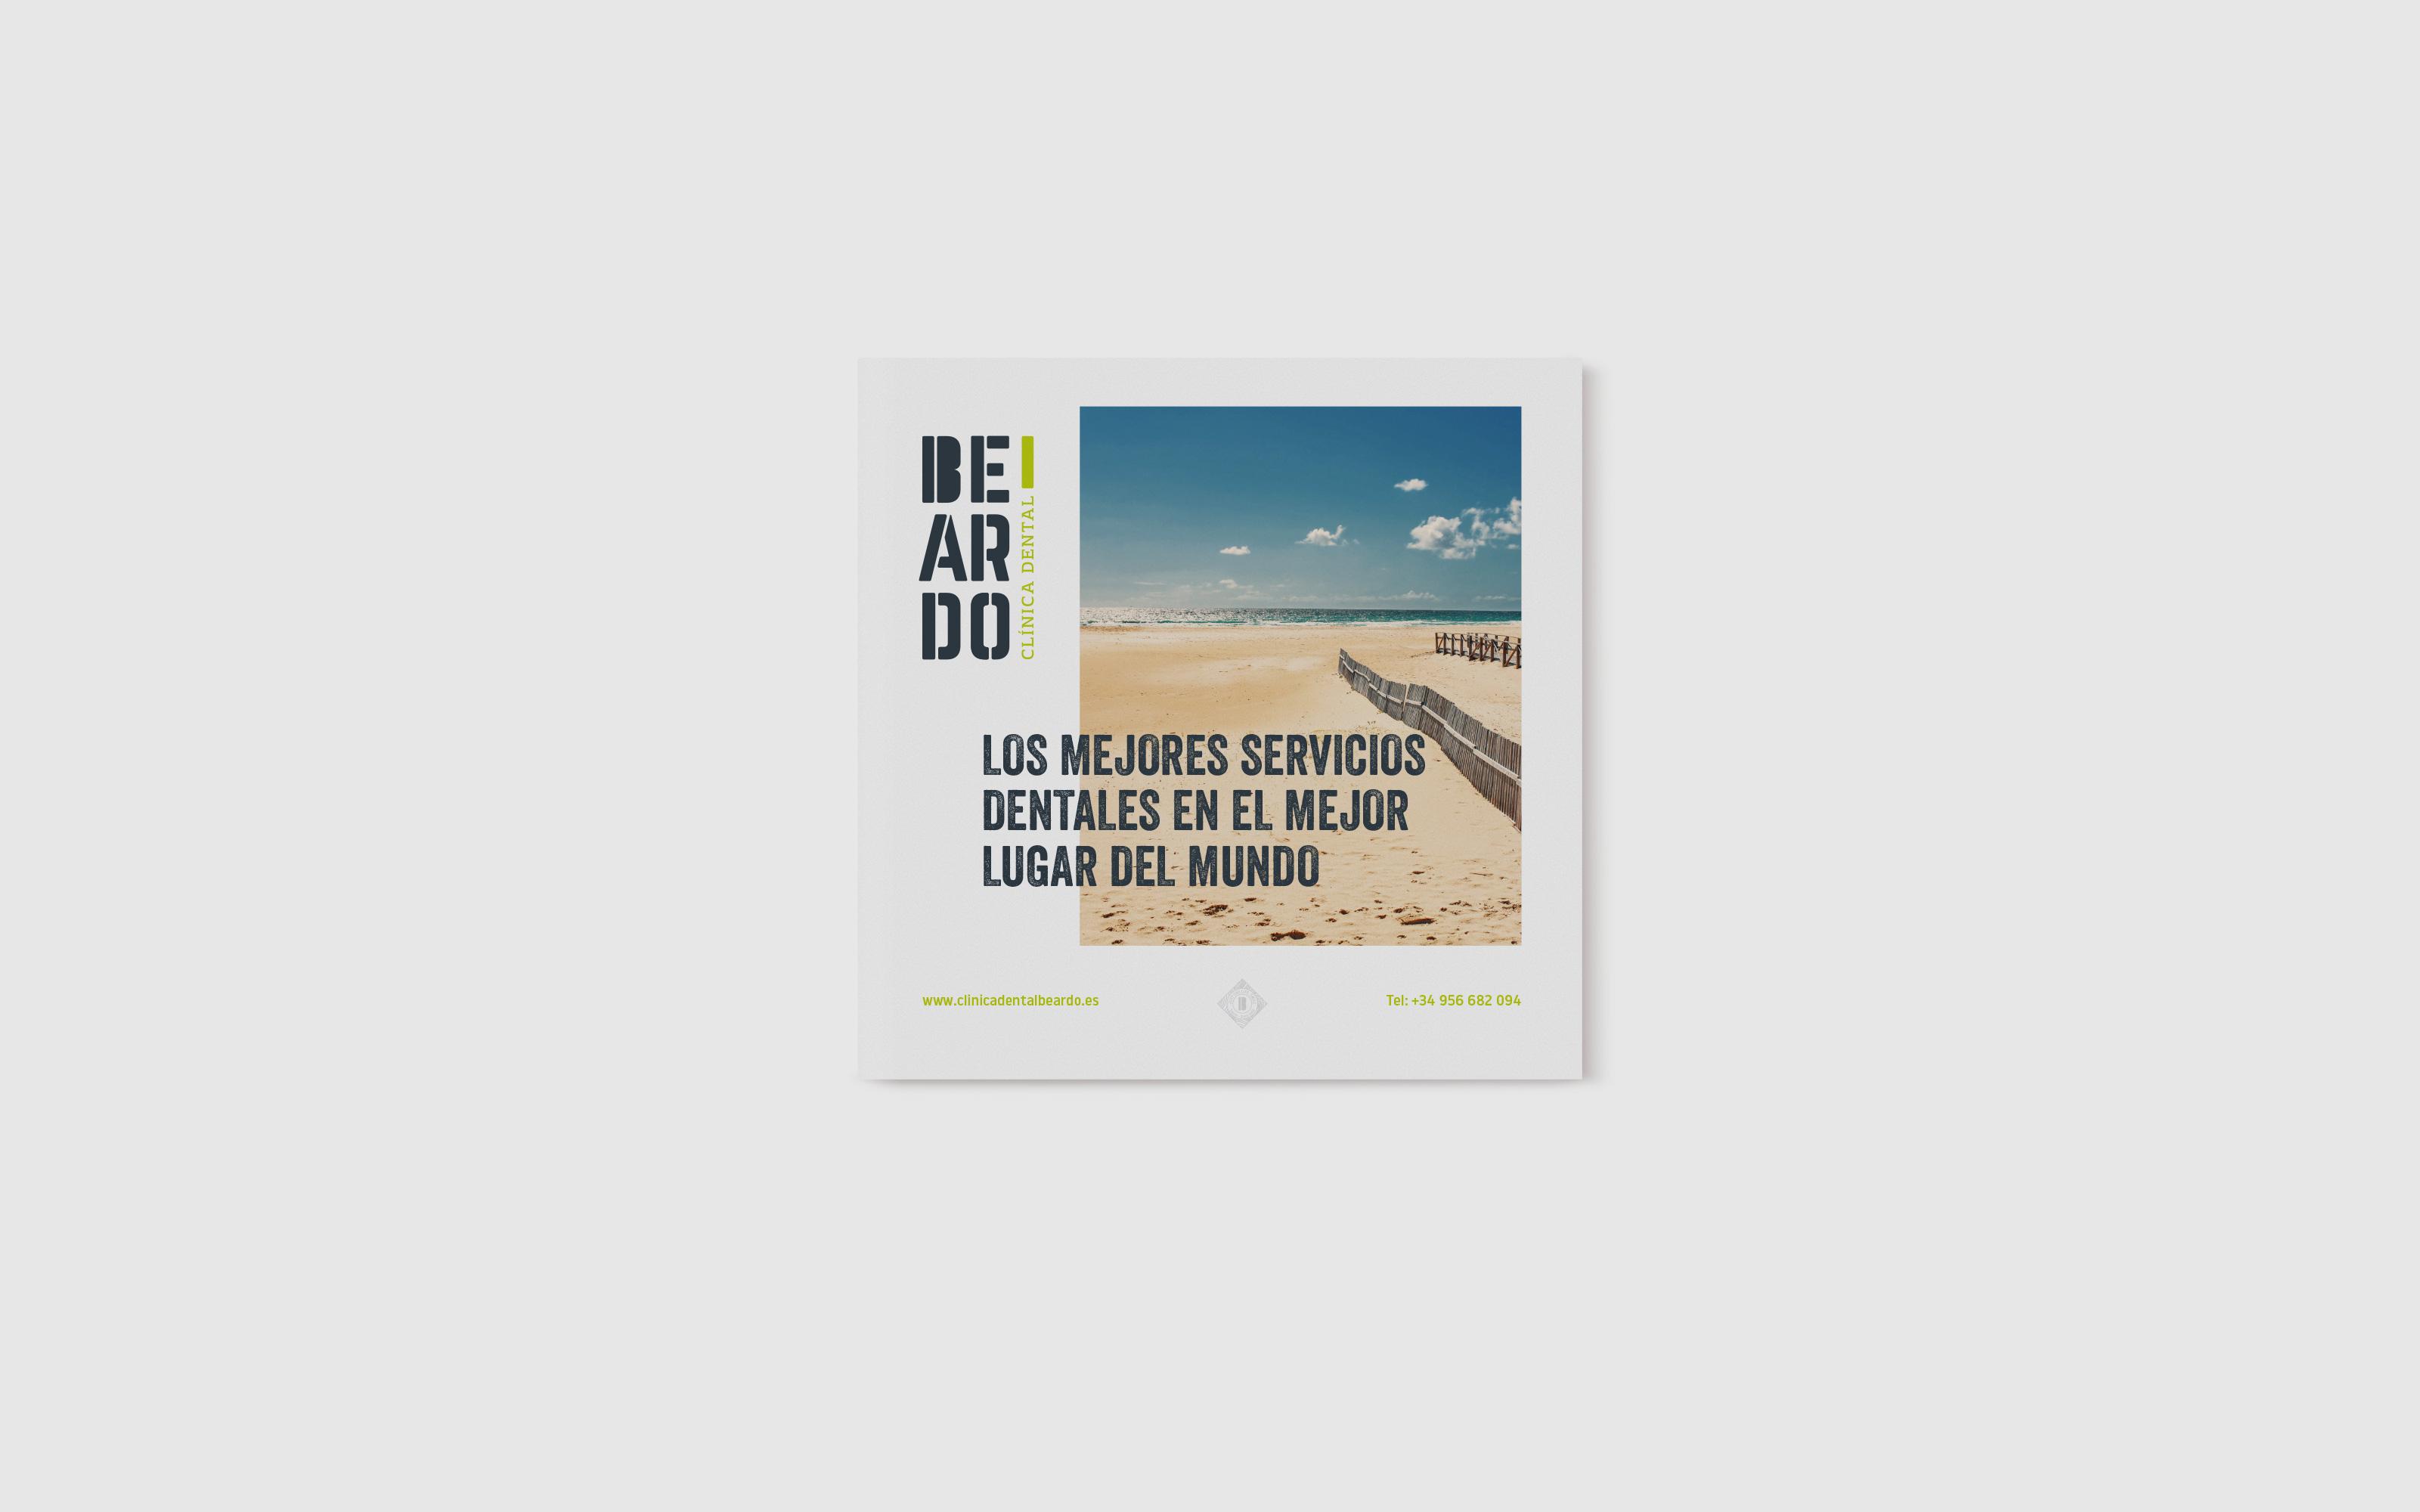 diseño-marca-tarifa-agencia-adhoc-2